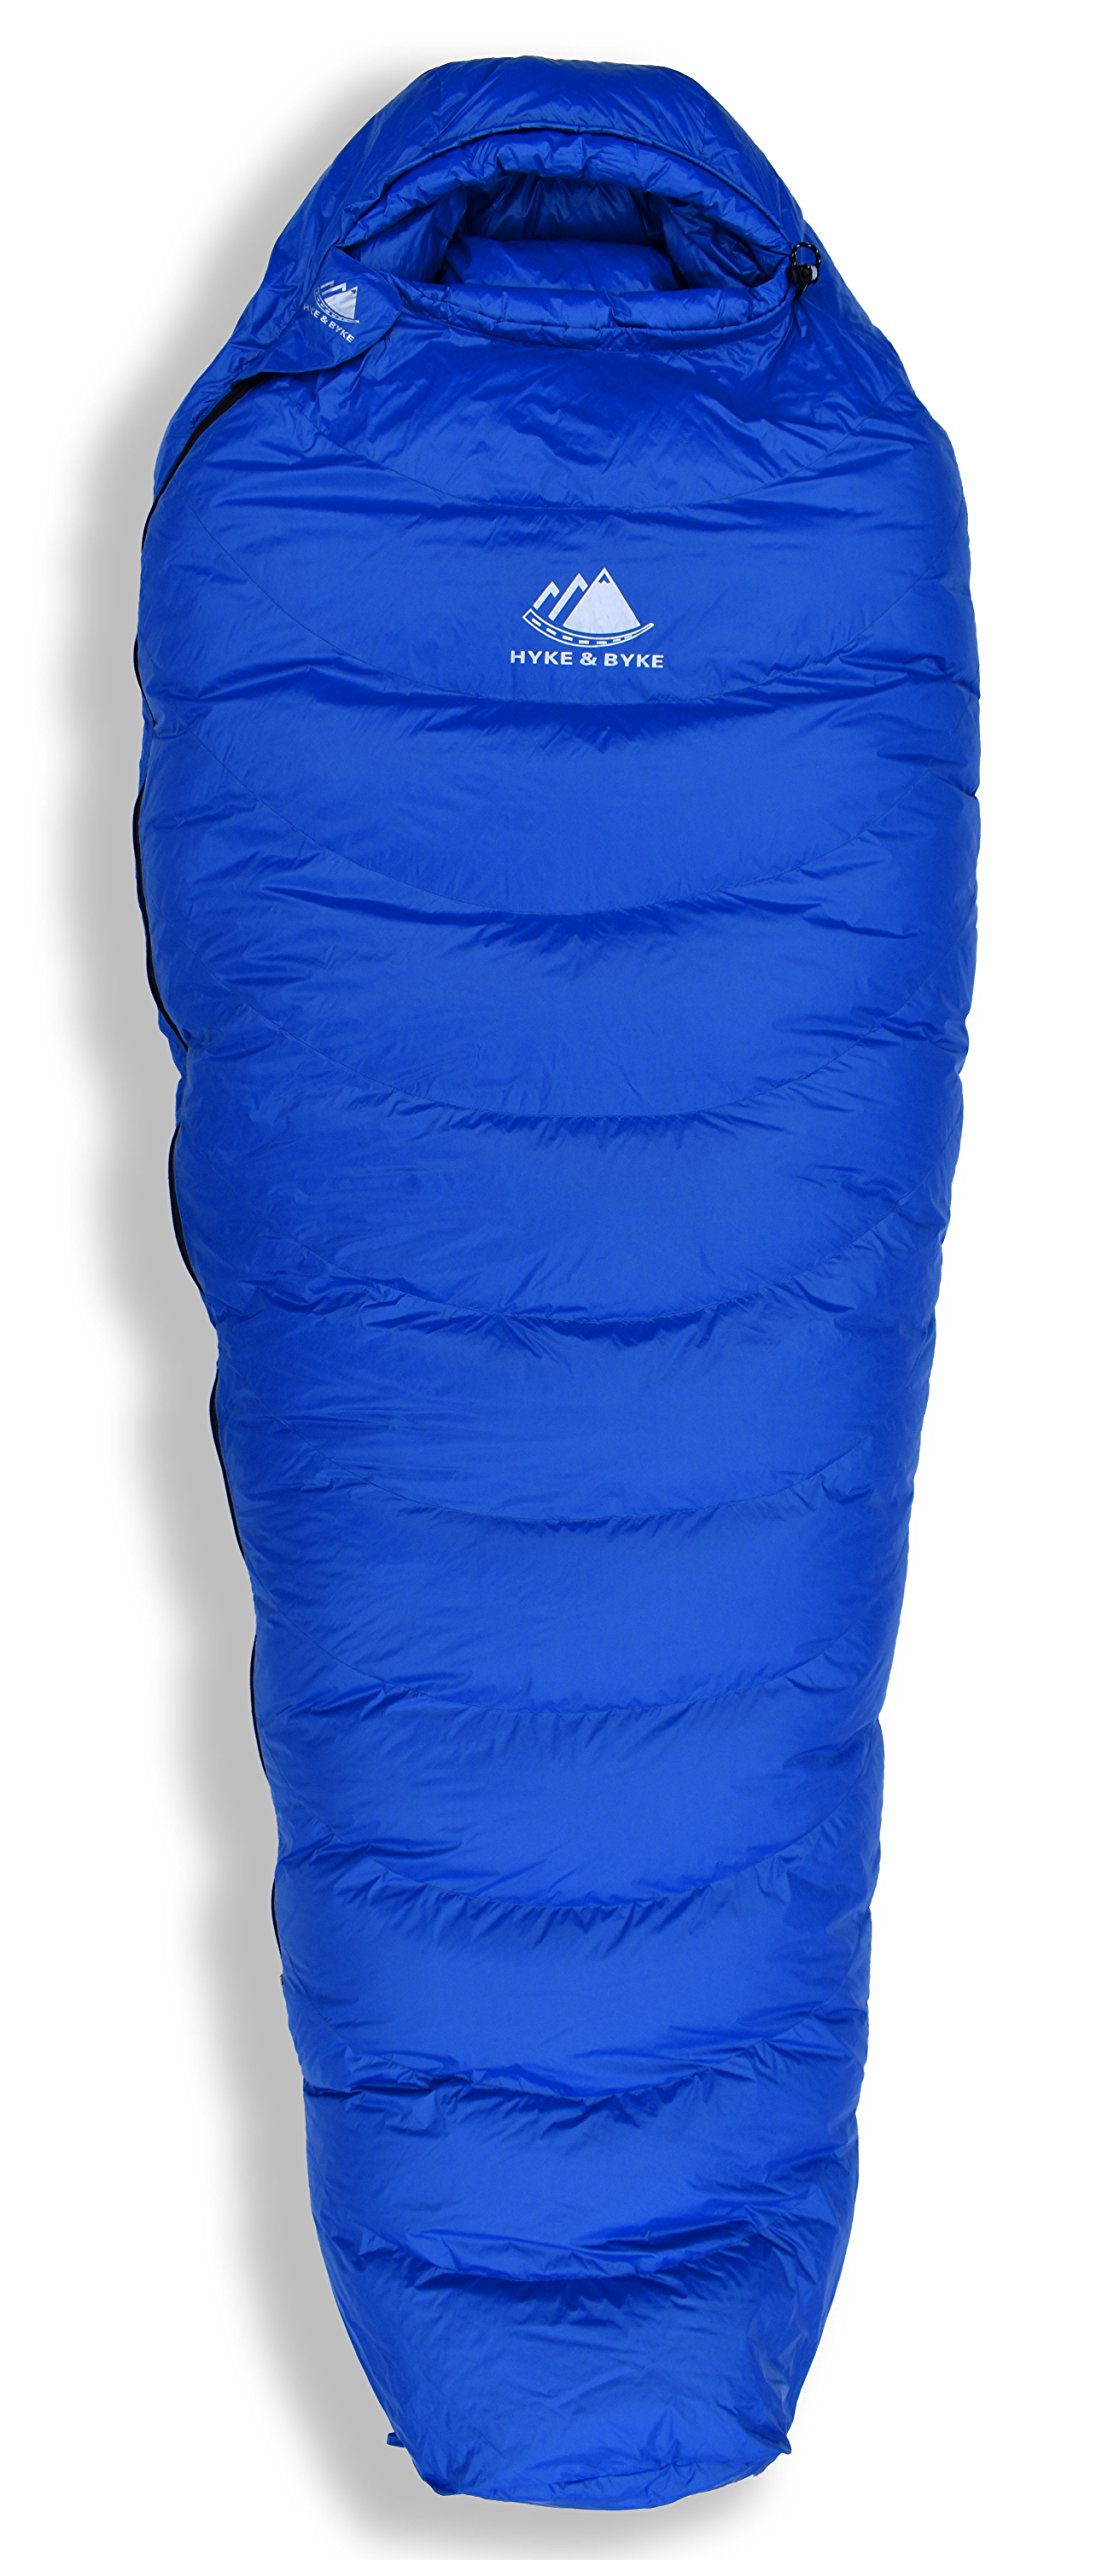 Hyke & Byke Quandary 15 Degree F 650 Fill Power Hydrophobic Down Sleeping Bag with ClusterLoft Base - Ultra Lightweight 3 Season Men's and Women's Mummy Bag Designed for Backpacking 5